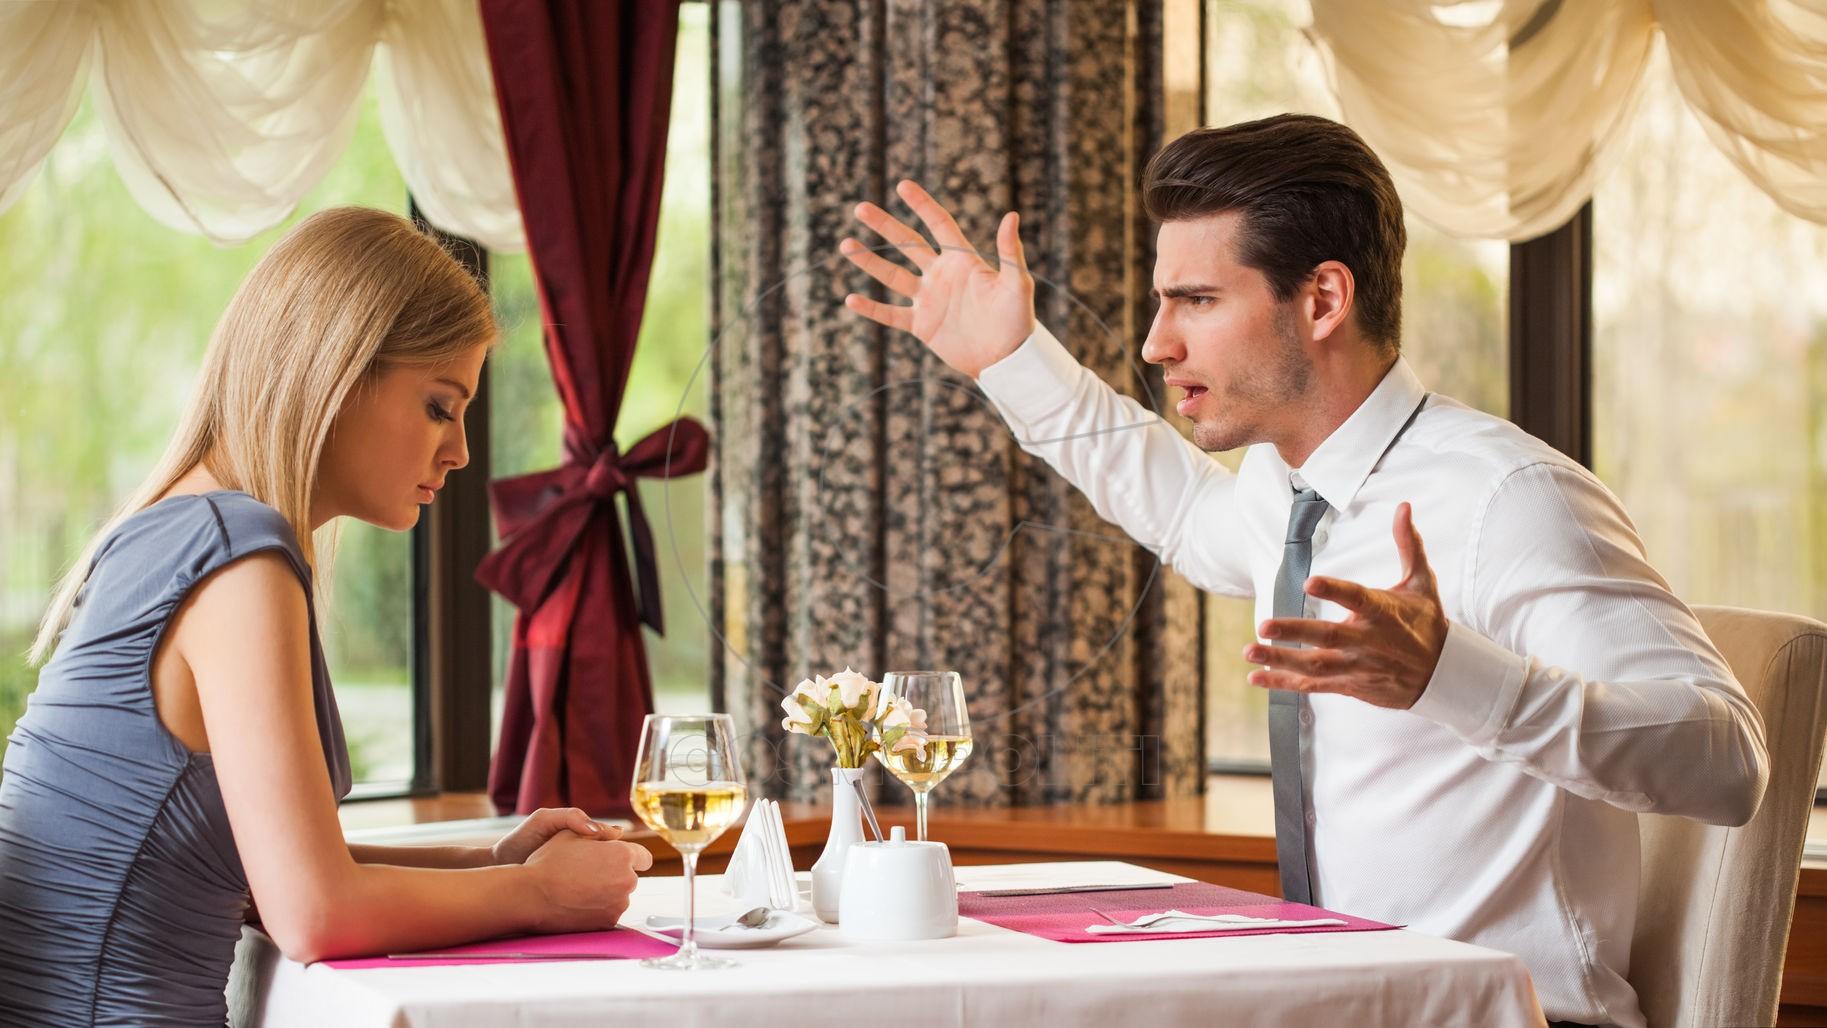 Man-fight-woman-restaurant-1